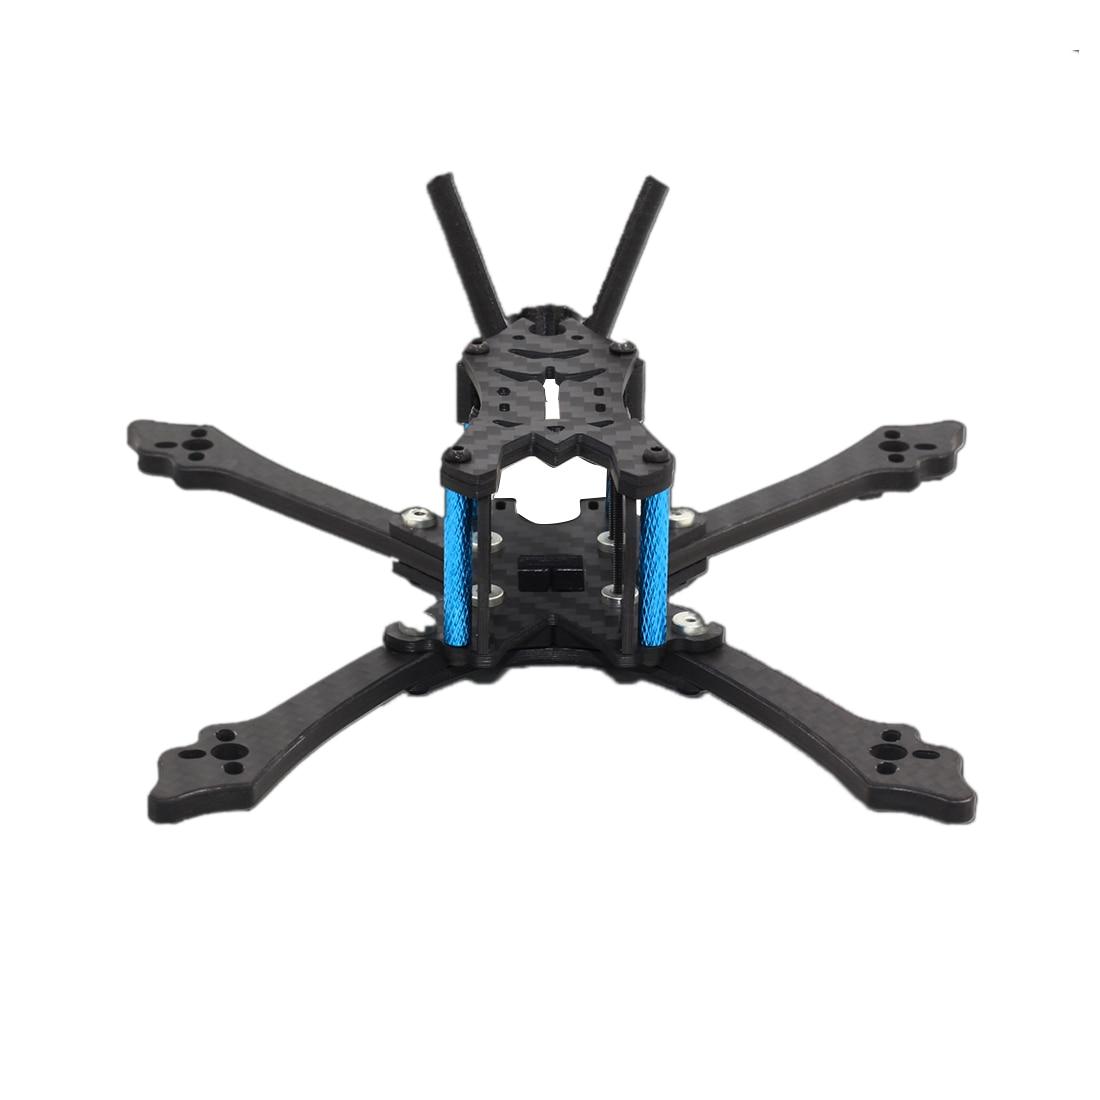 HGLRC Arrow3 152mm 3 Inch F4 OSD 4S / 6S Mini FPV Racing Drone PNP BNF with 45A ESC Caddx Ratel 1200TVL Camera RC Quadcopter - 5